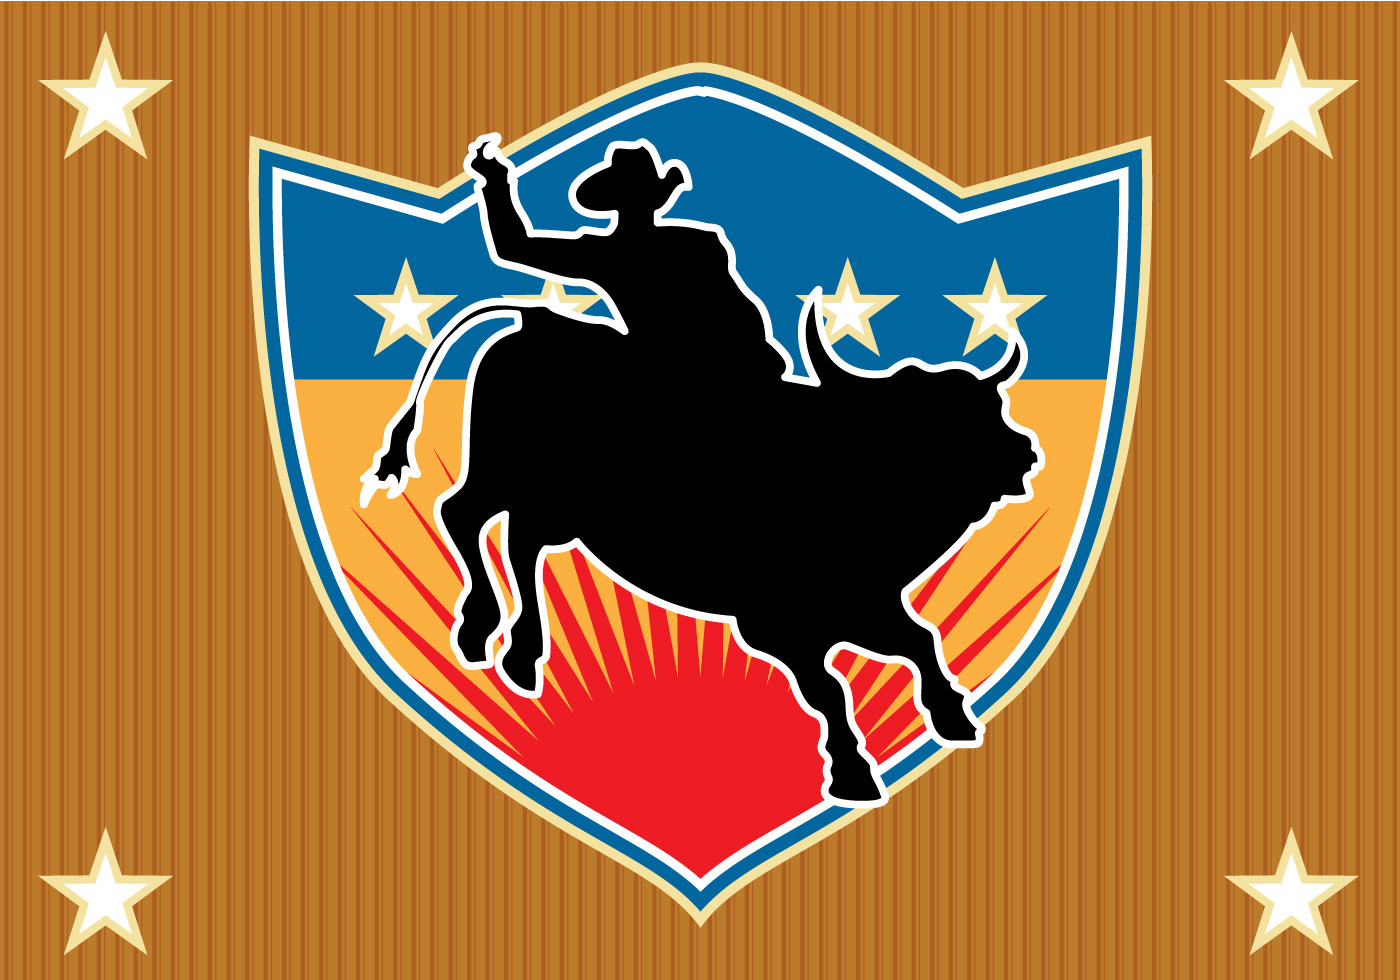 Free Bull Rider Vector - Download Free Vector Art, Stock ...